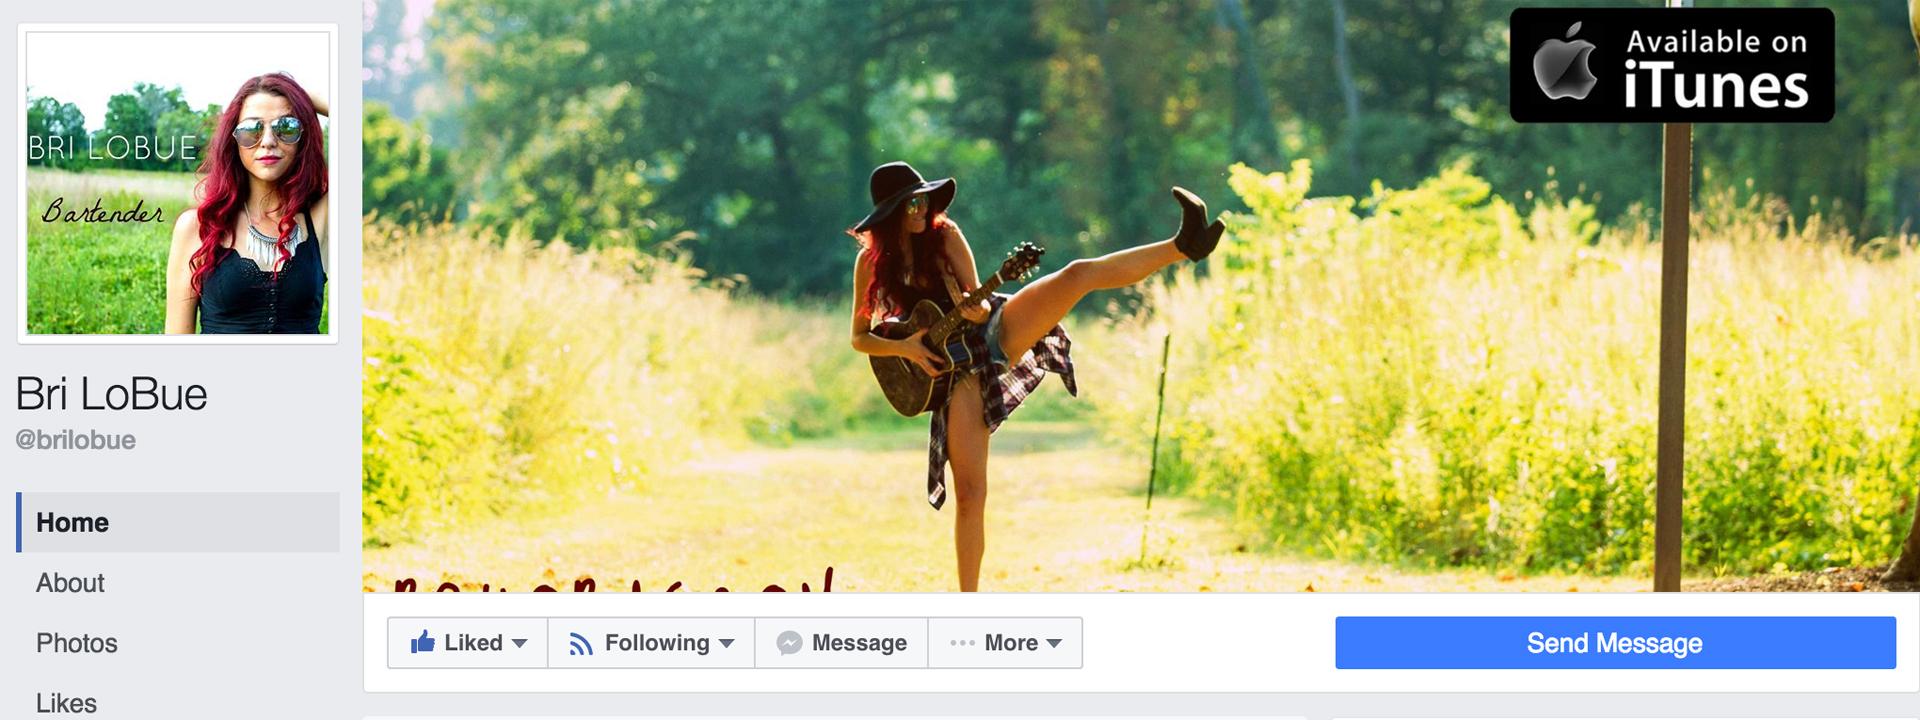 Facebook.com/brilobue